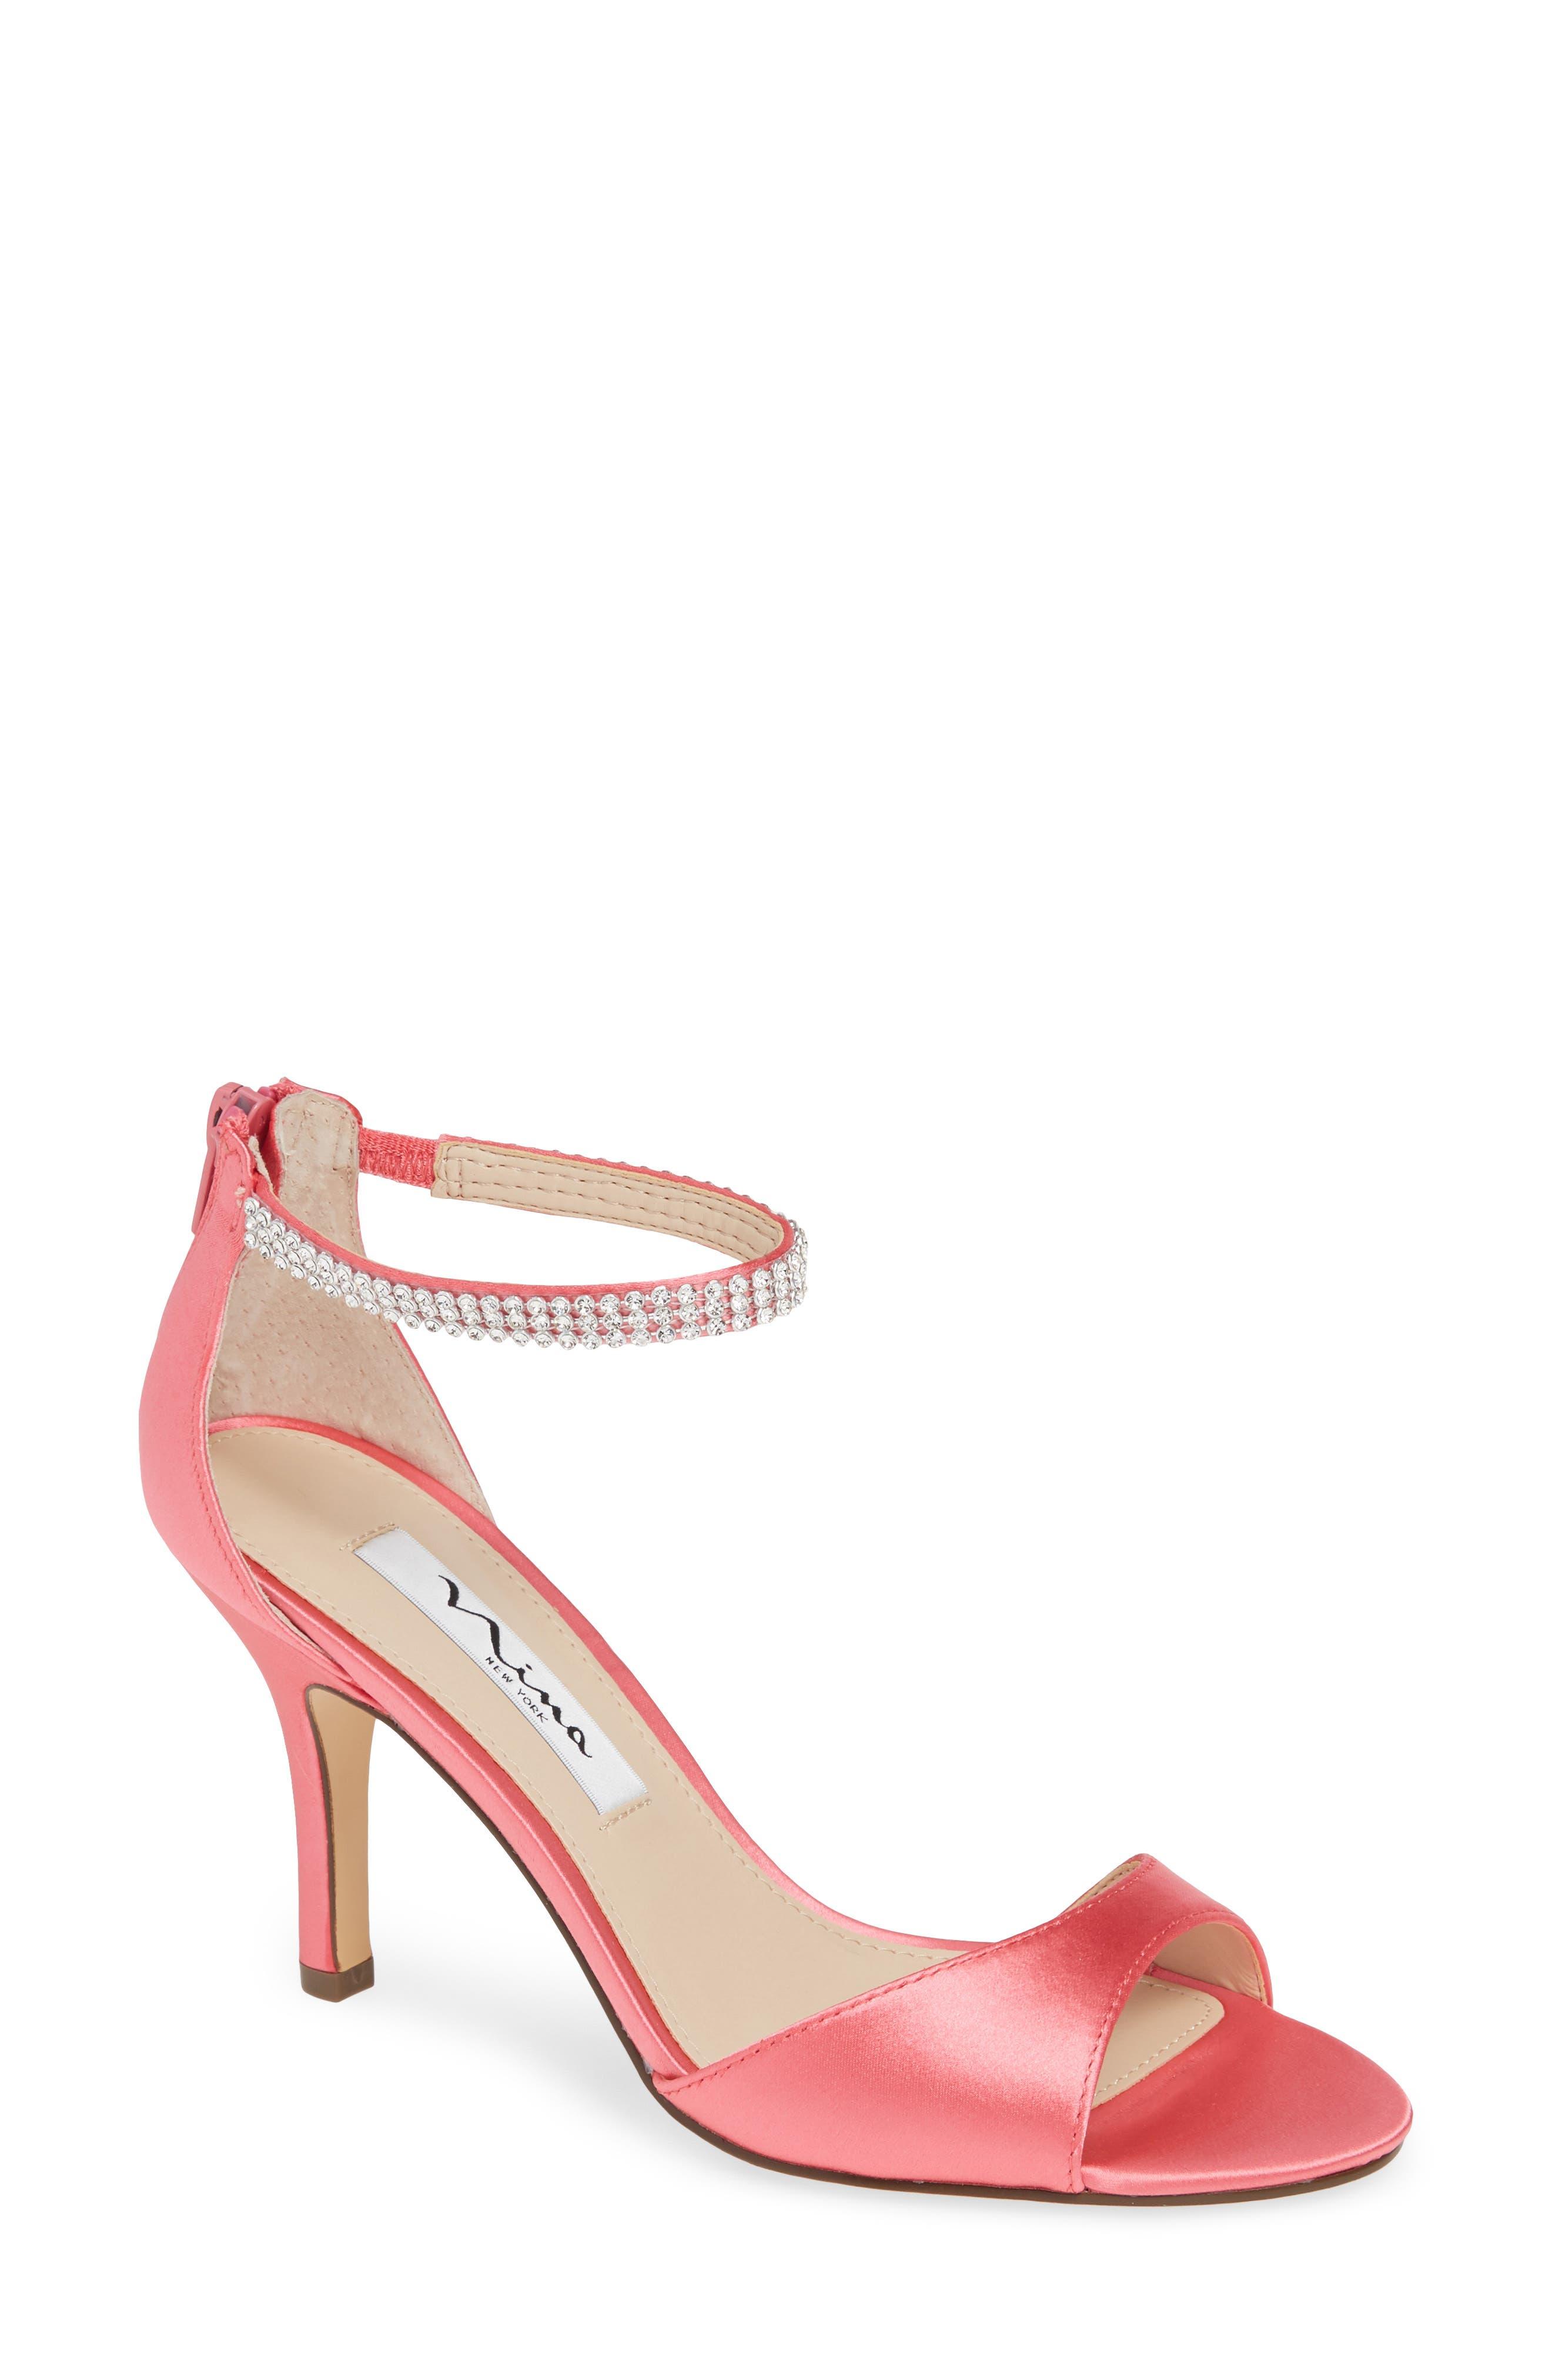 Volanda Ankle Strap Sandal, Main, color, STRAWBERRY PUNCH SATIN